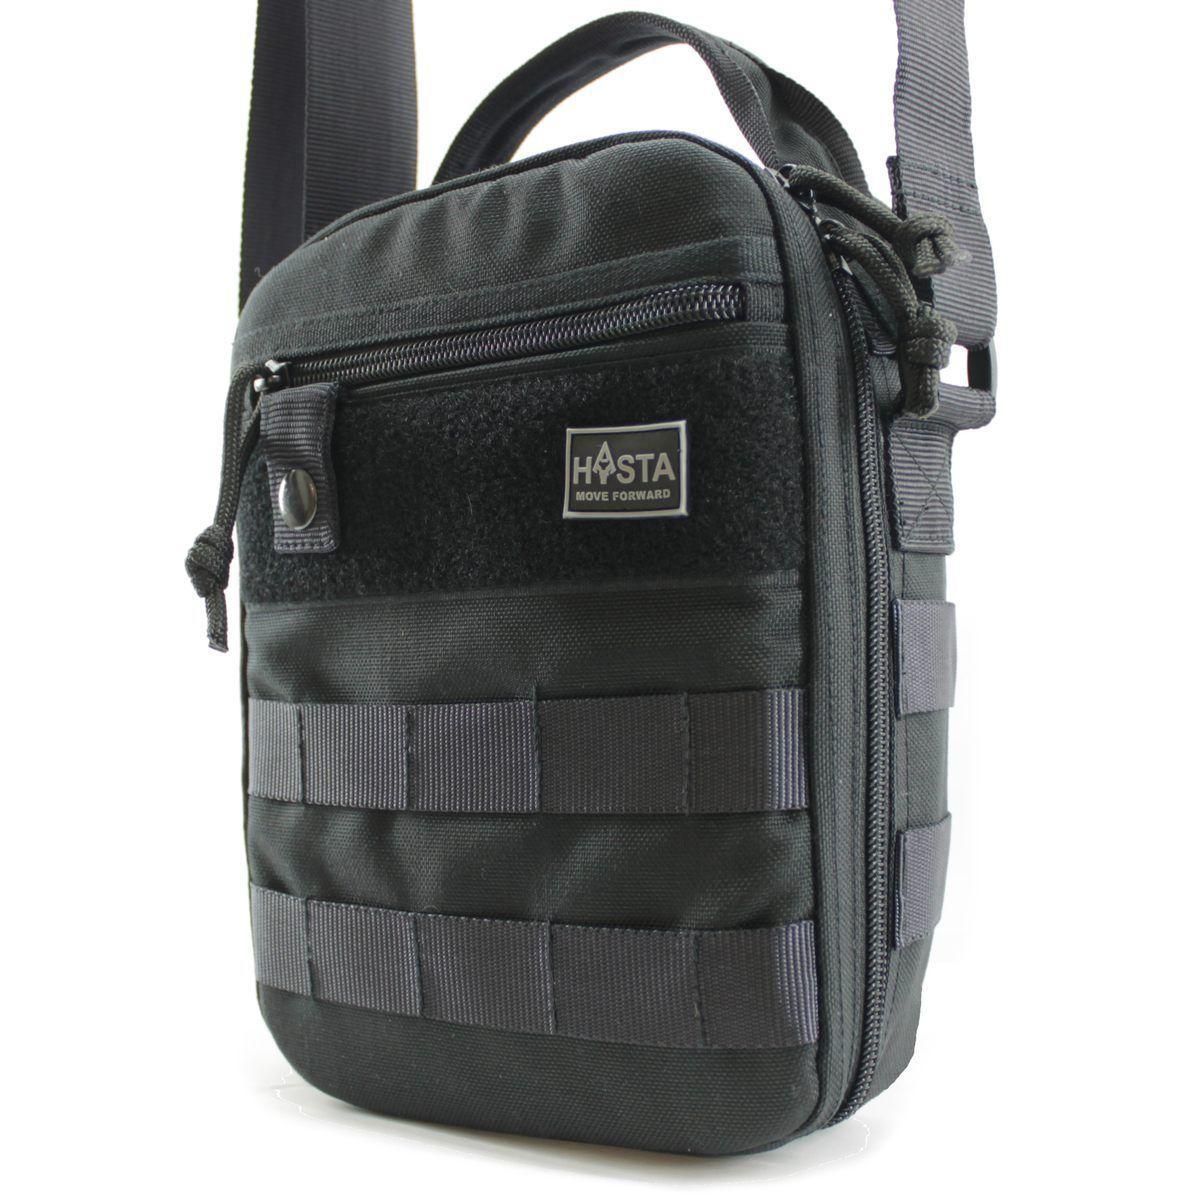 37aa832392c4 Сумка Hasta Multibag S Black (11 001 099) - Best baggs в Хмельницком